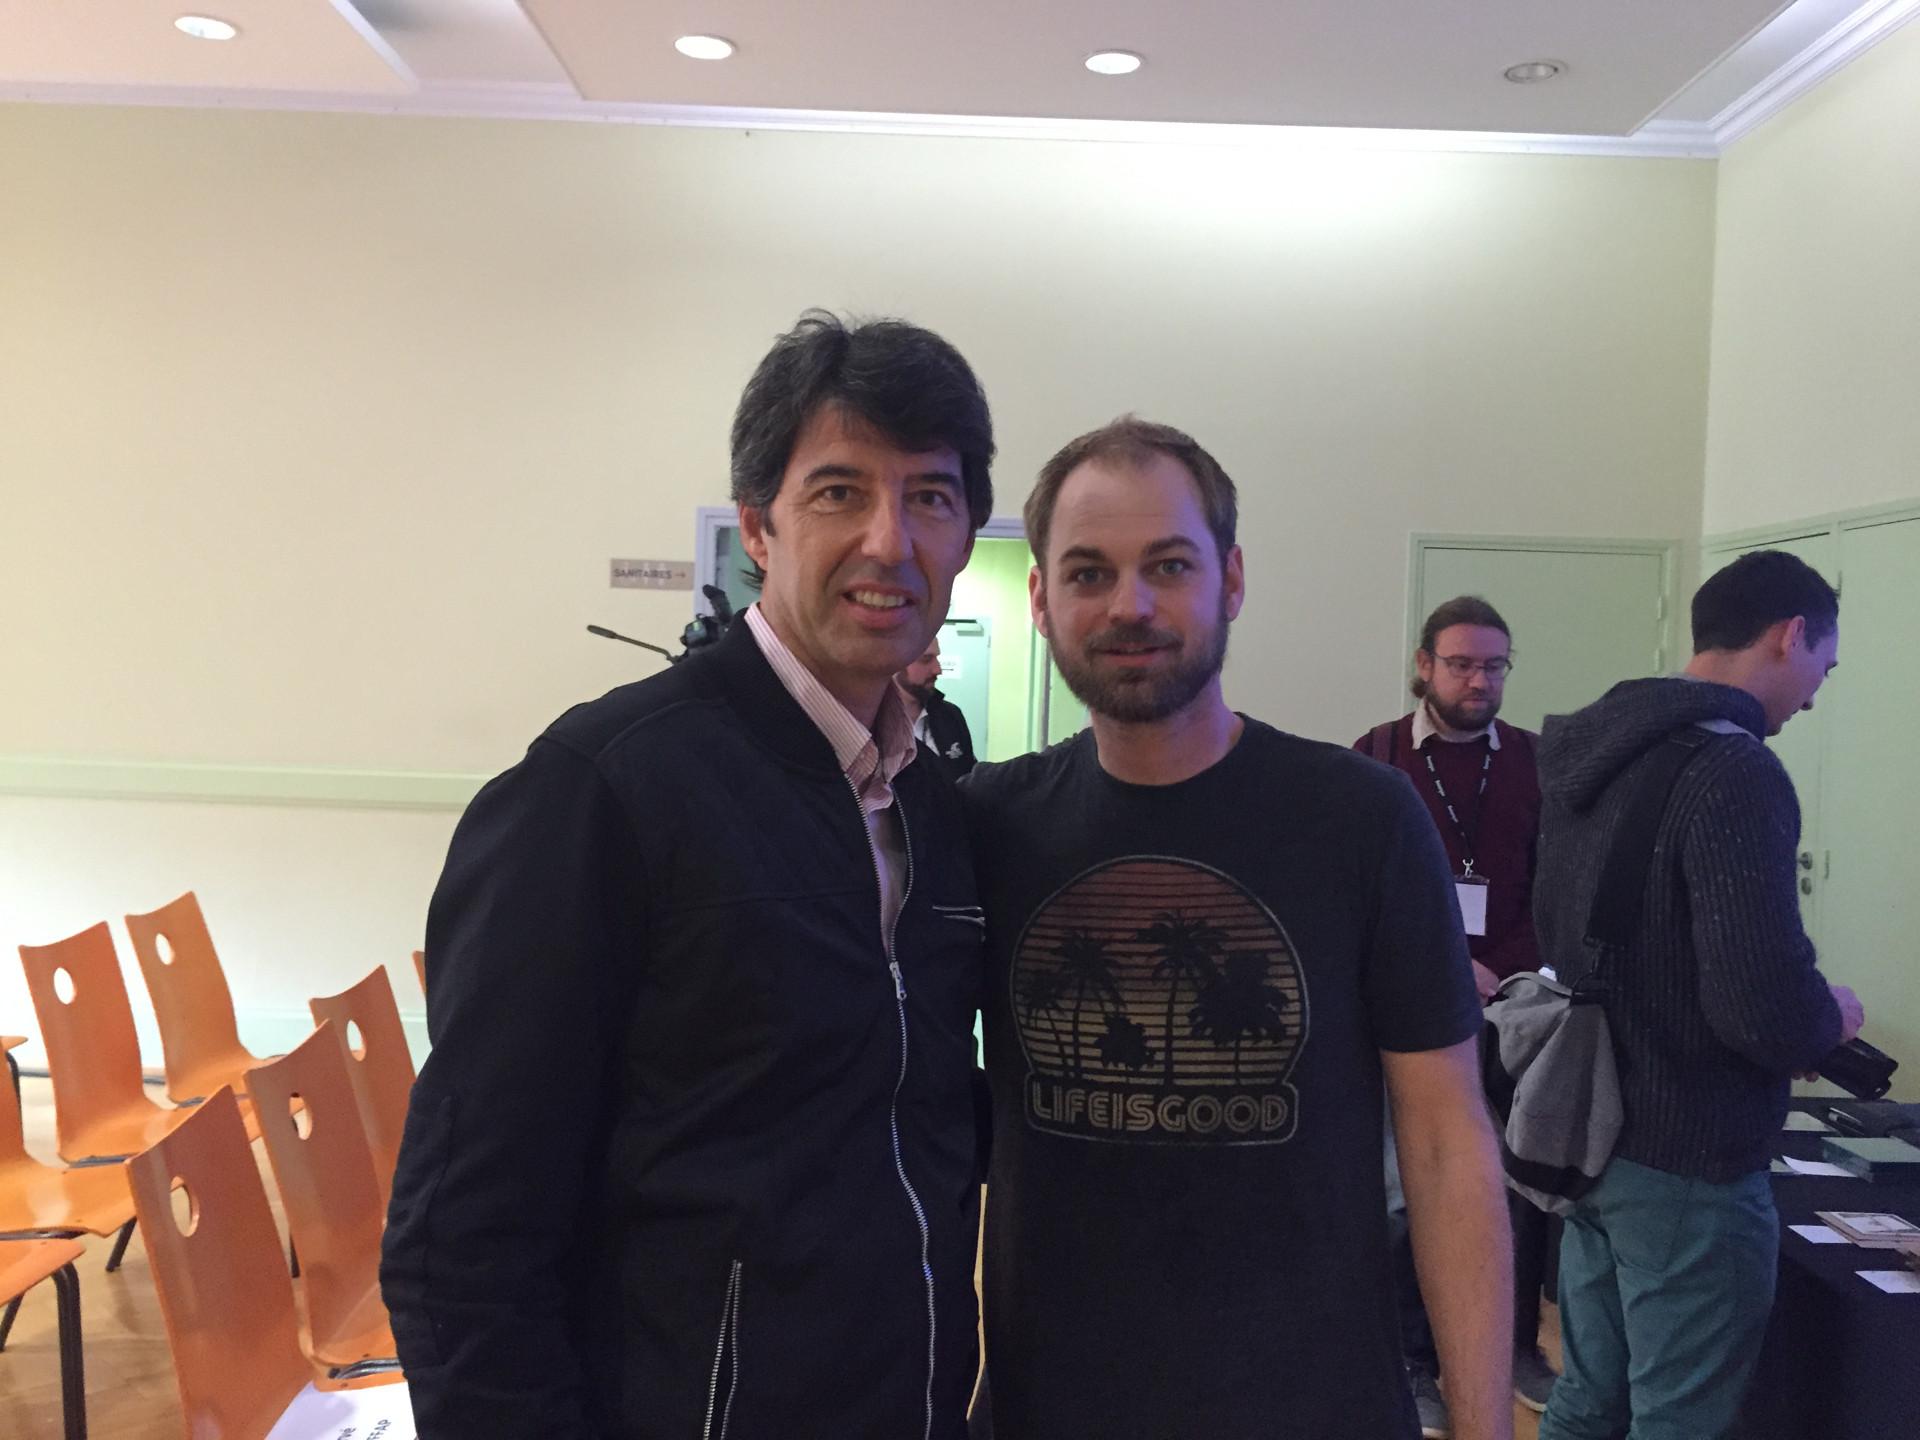 Avec Wayne Houchin, magicien à Las Vegas - People & TV – Chris Dorléac